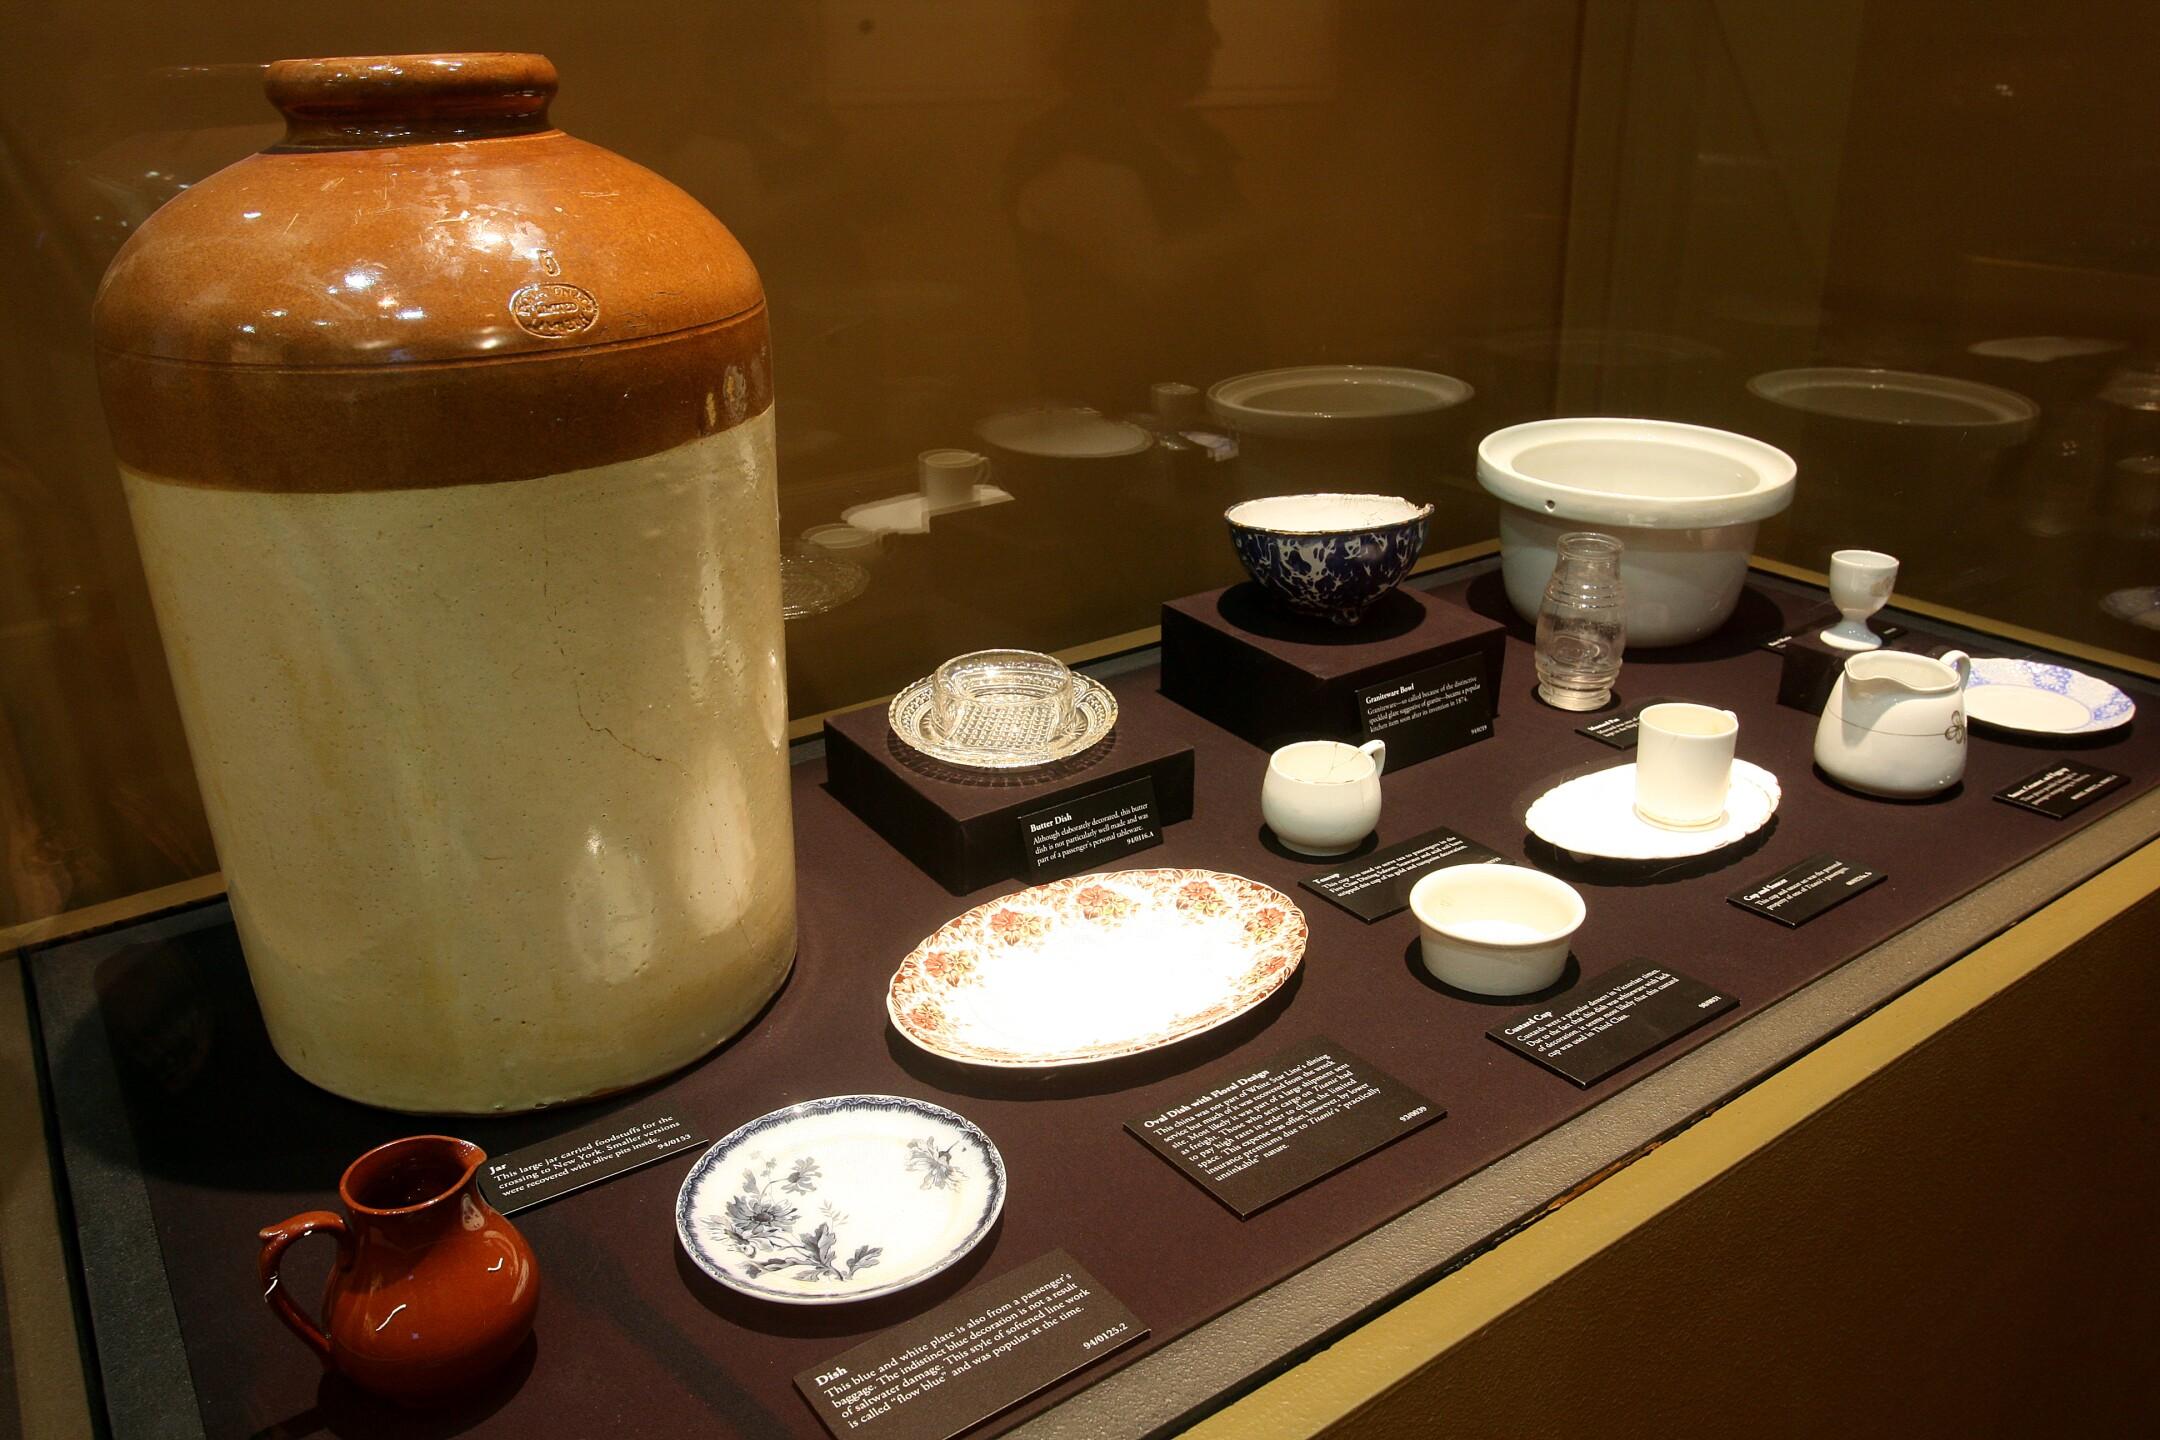 Ceramic Jug, Various China, Egg Cup_Titanic the Artifact Exhibition at Luxor Hotel & Casino.jpg